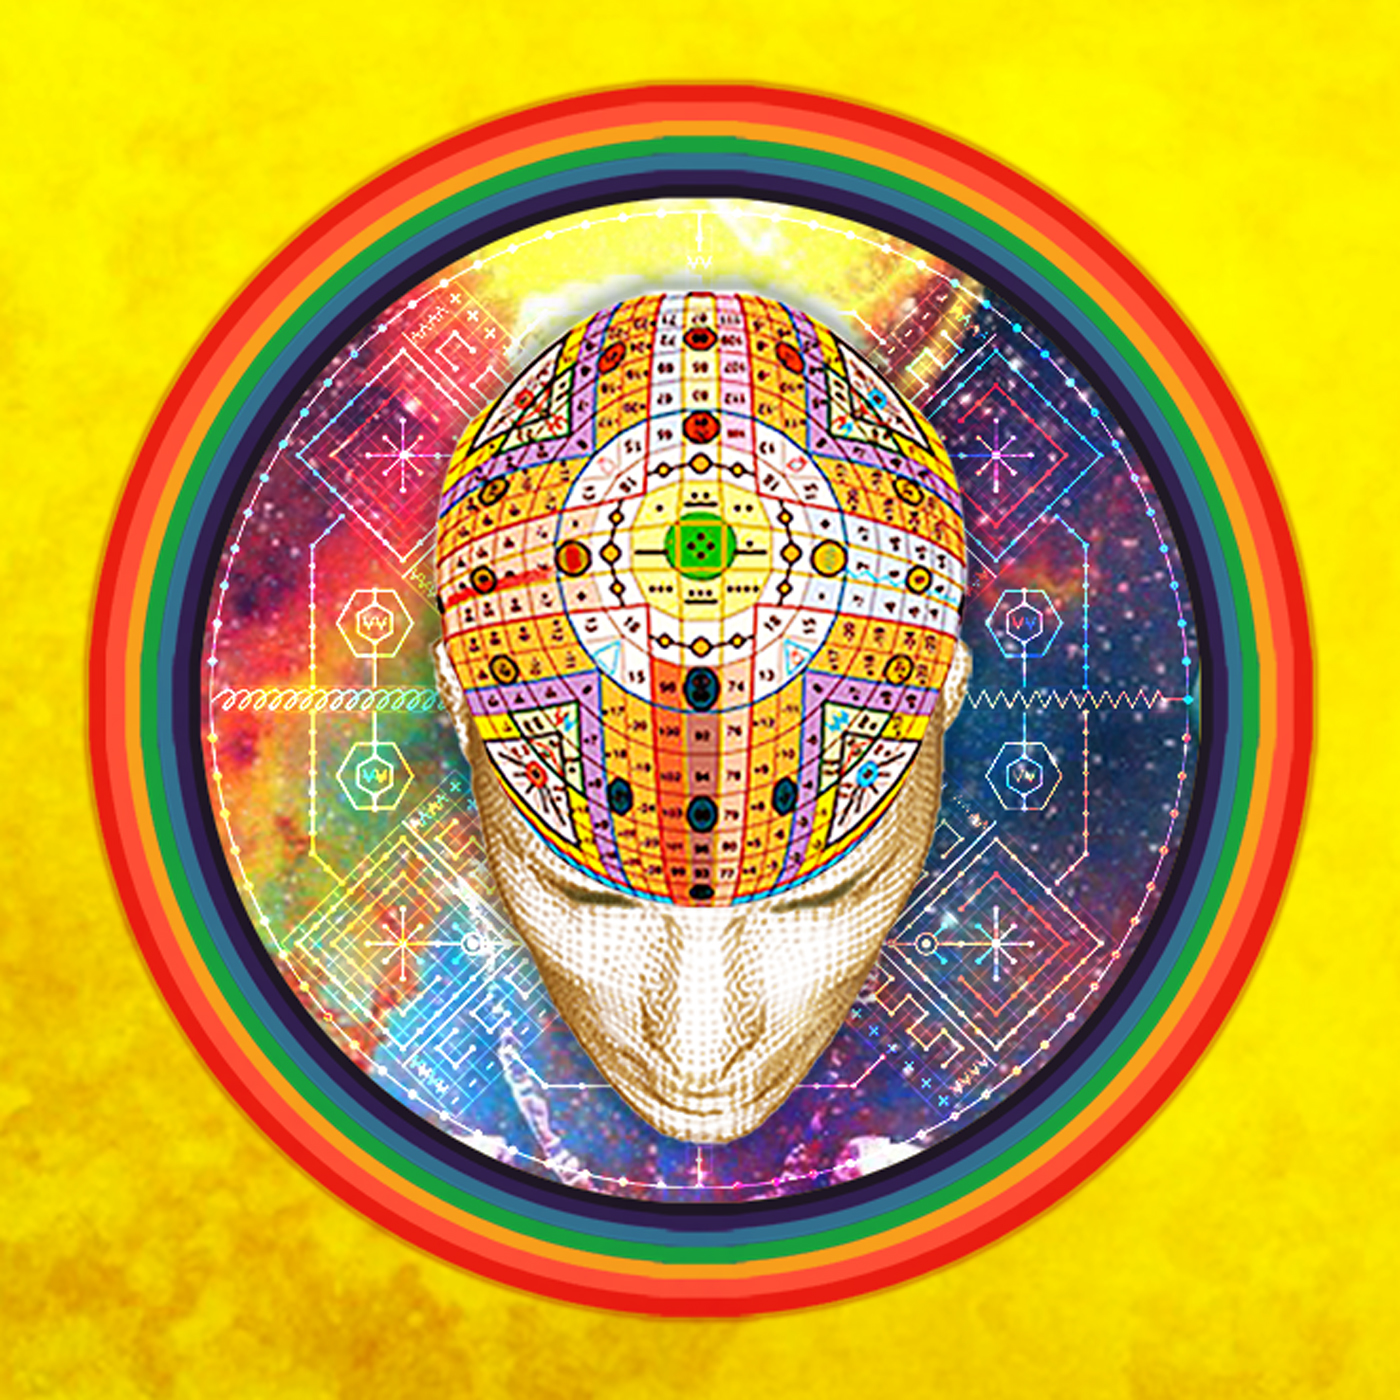 1320 全腦調頻音樂導引:KIN 183 磁性的藍夜|SYNCHROGALACTIC MEDITATION GUIDANCE|張之愷 JACK